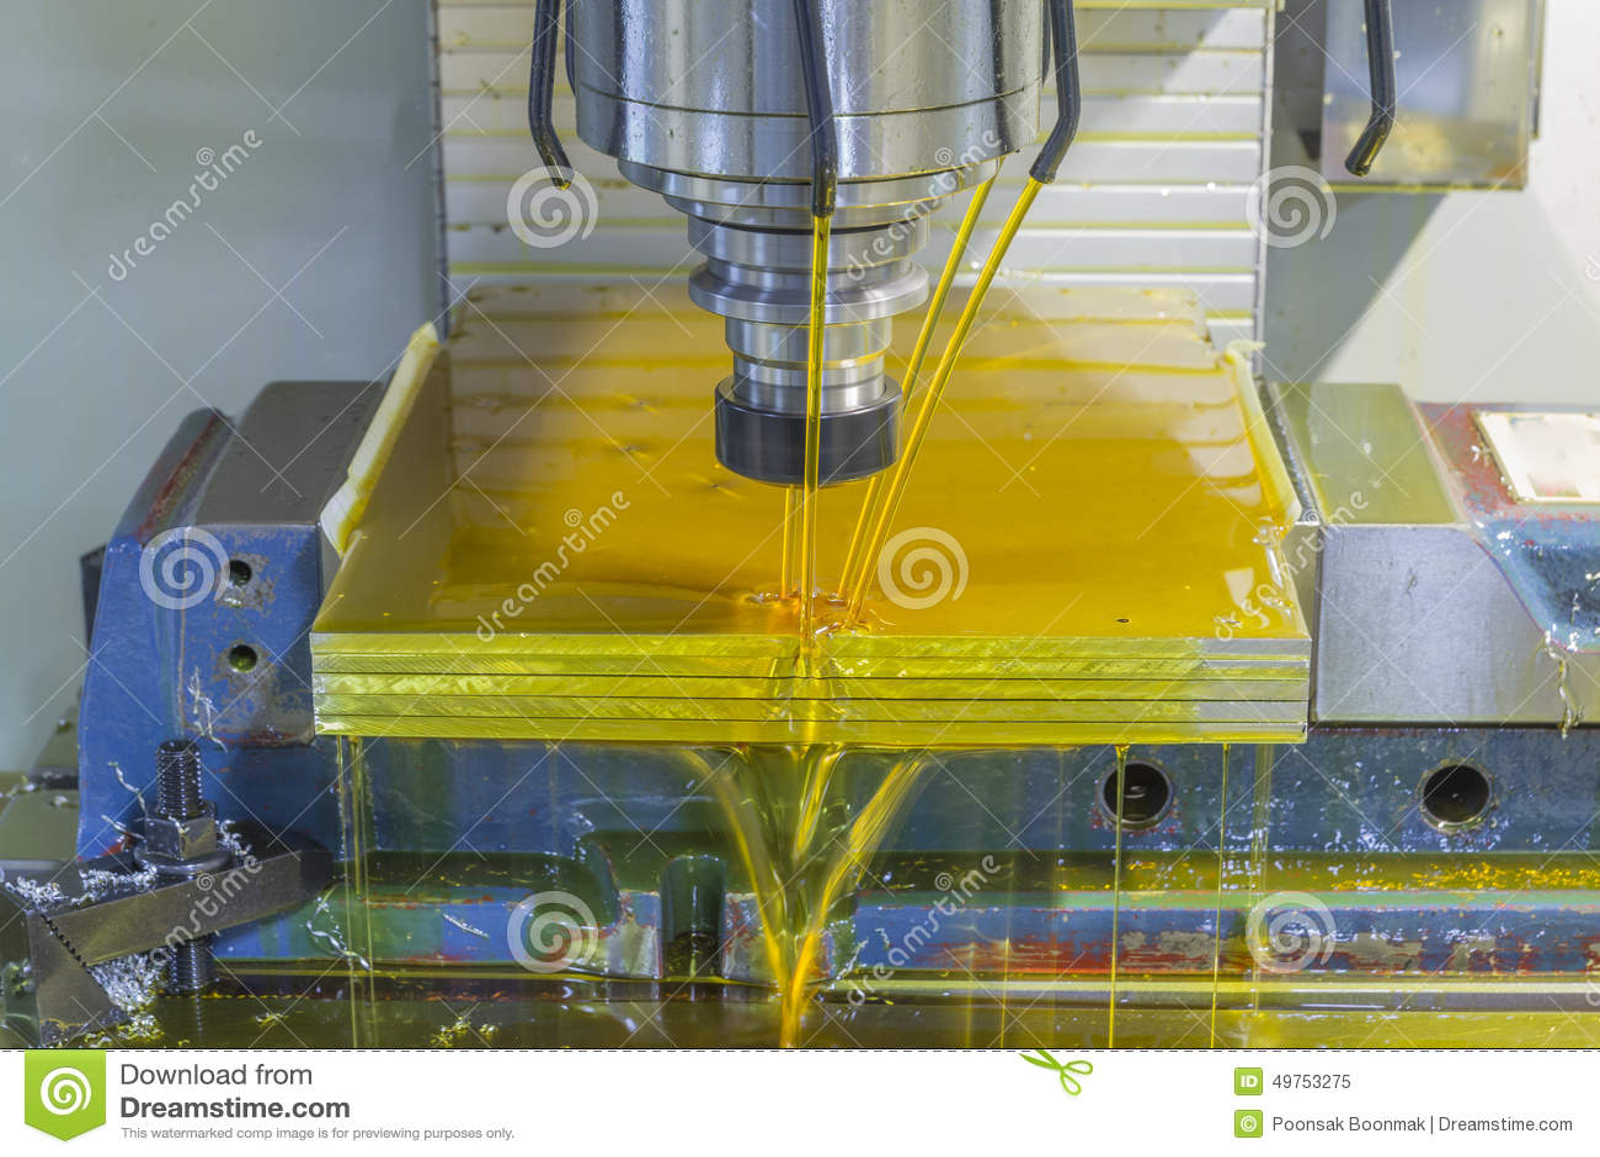 milling machine coolant